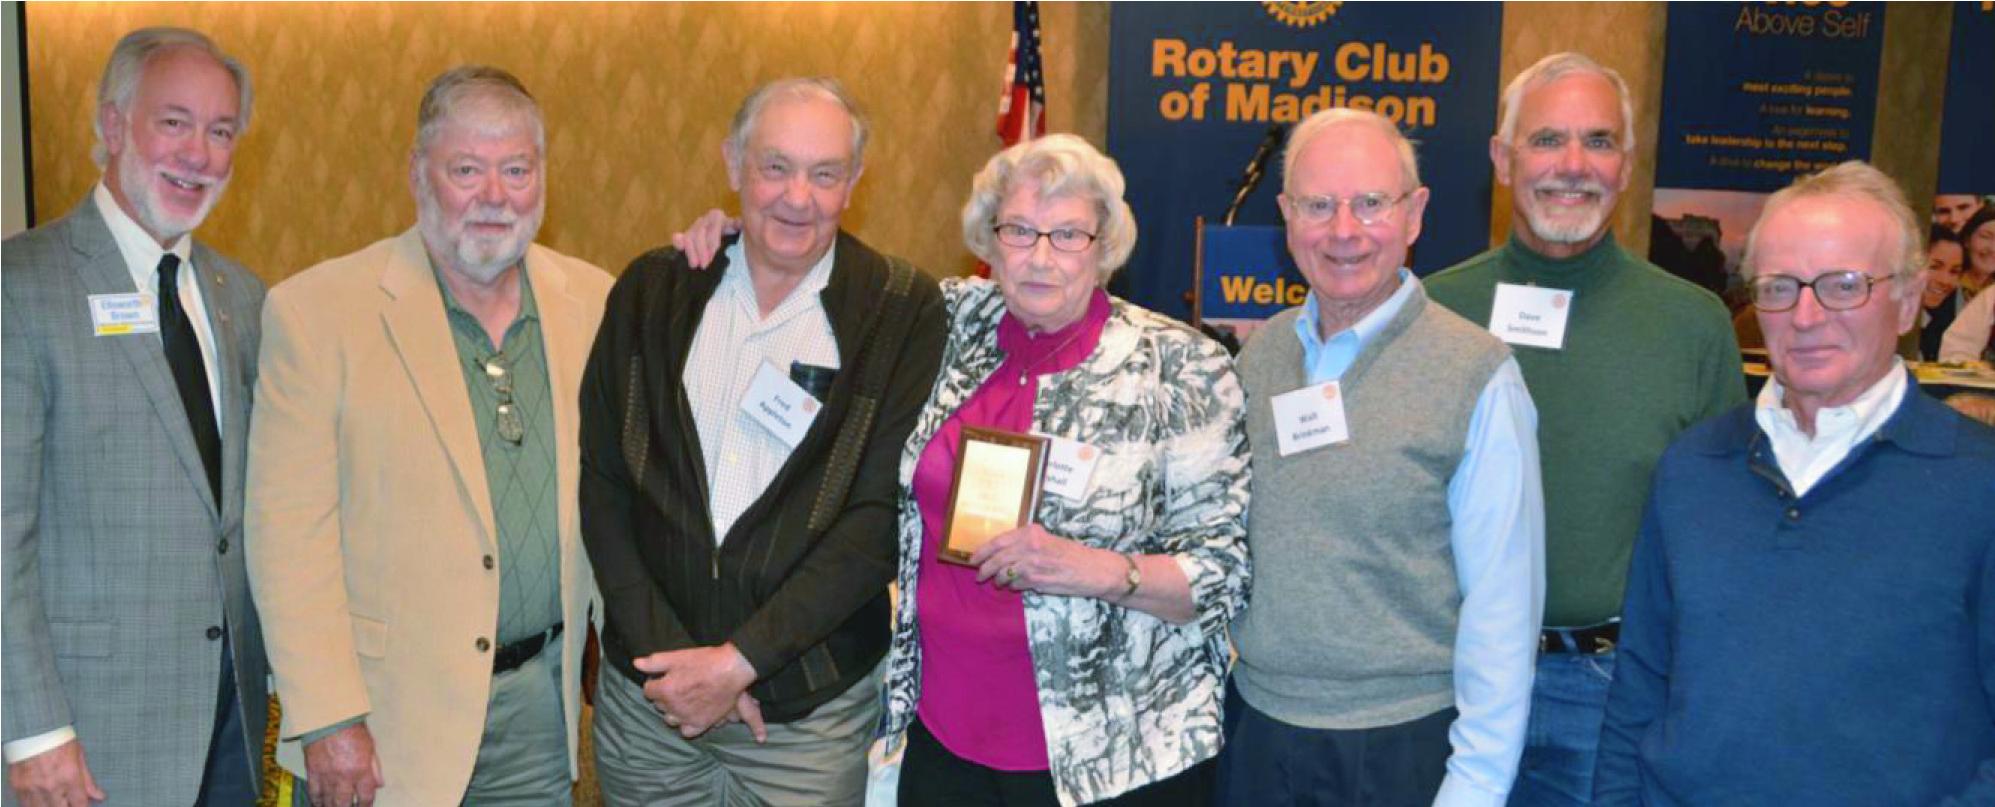 Rotary Senior Service Award Presented to Wheels for Winners Senior Team